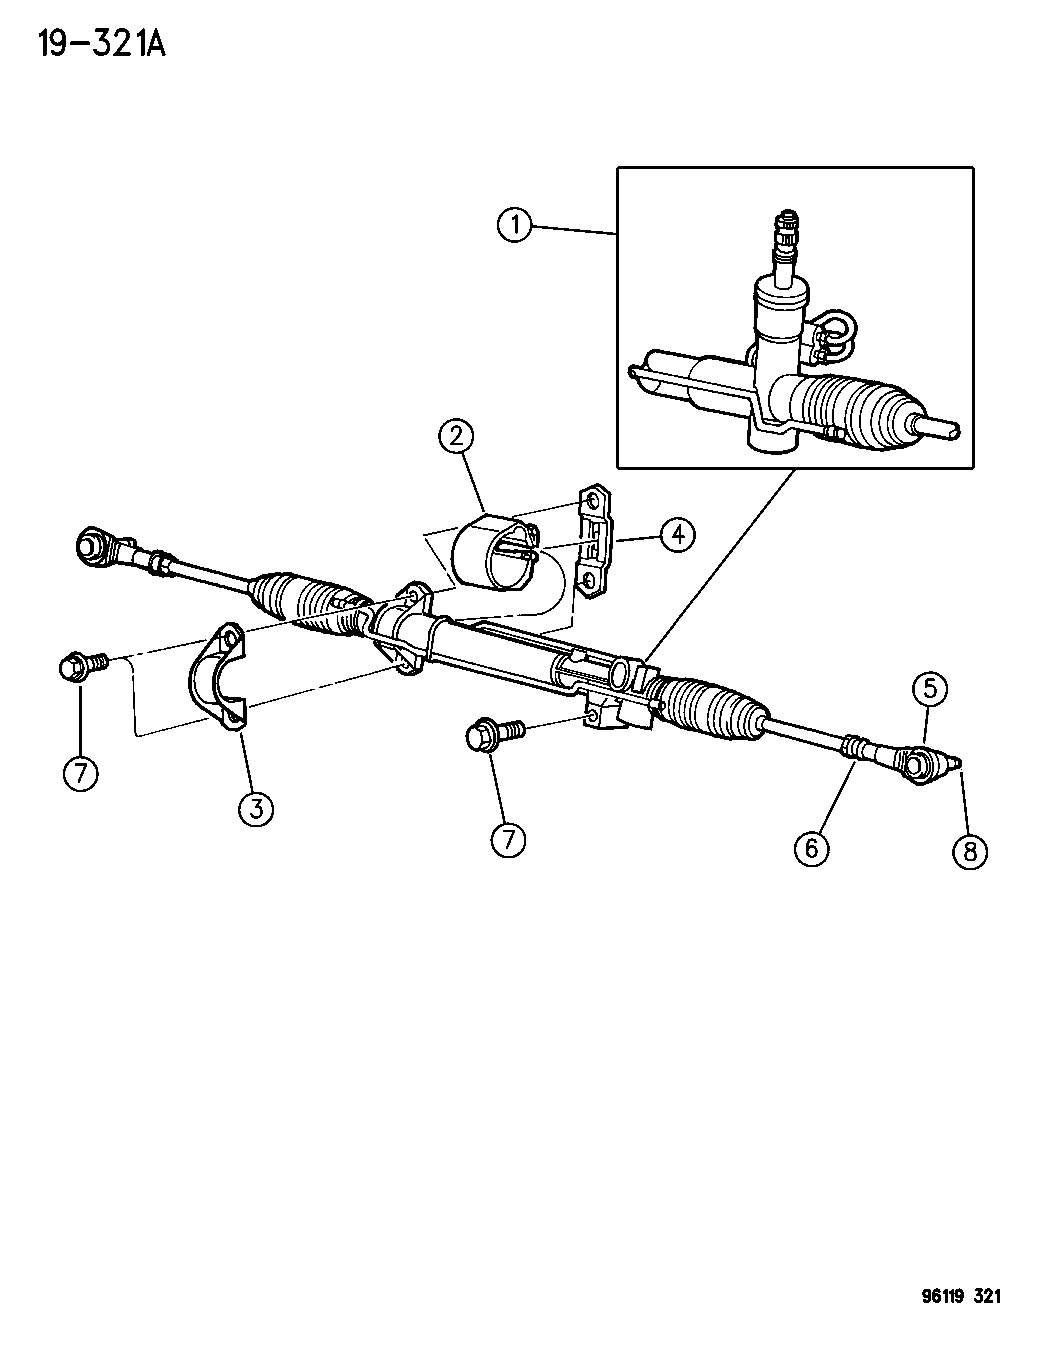 1996 Dodge Caravan Transmission Parts Diagram • Wiring